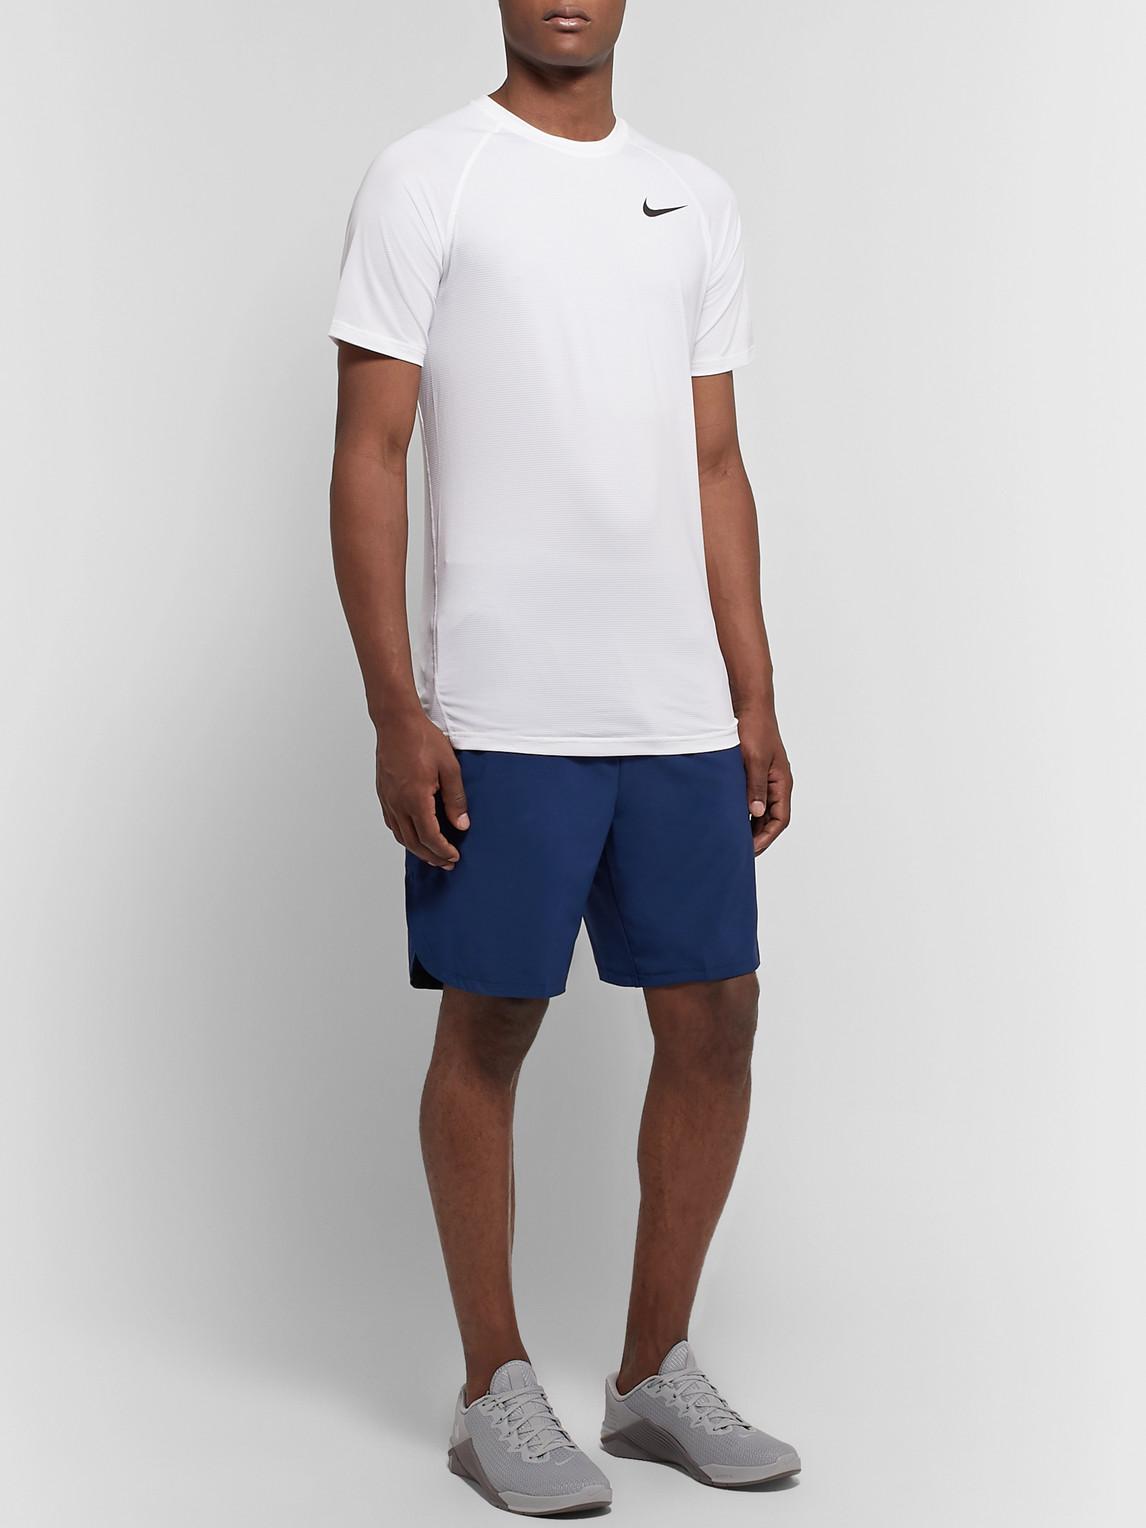 Nike Tops FLEX STRETCH